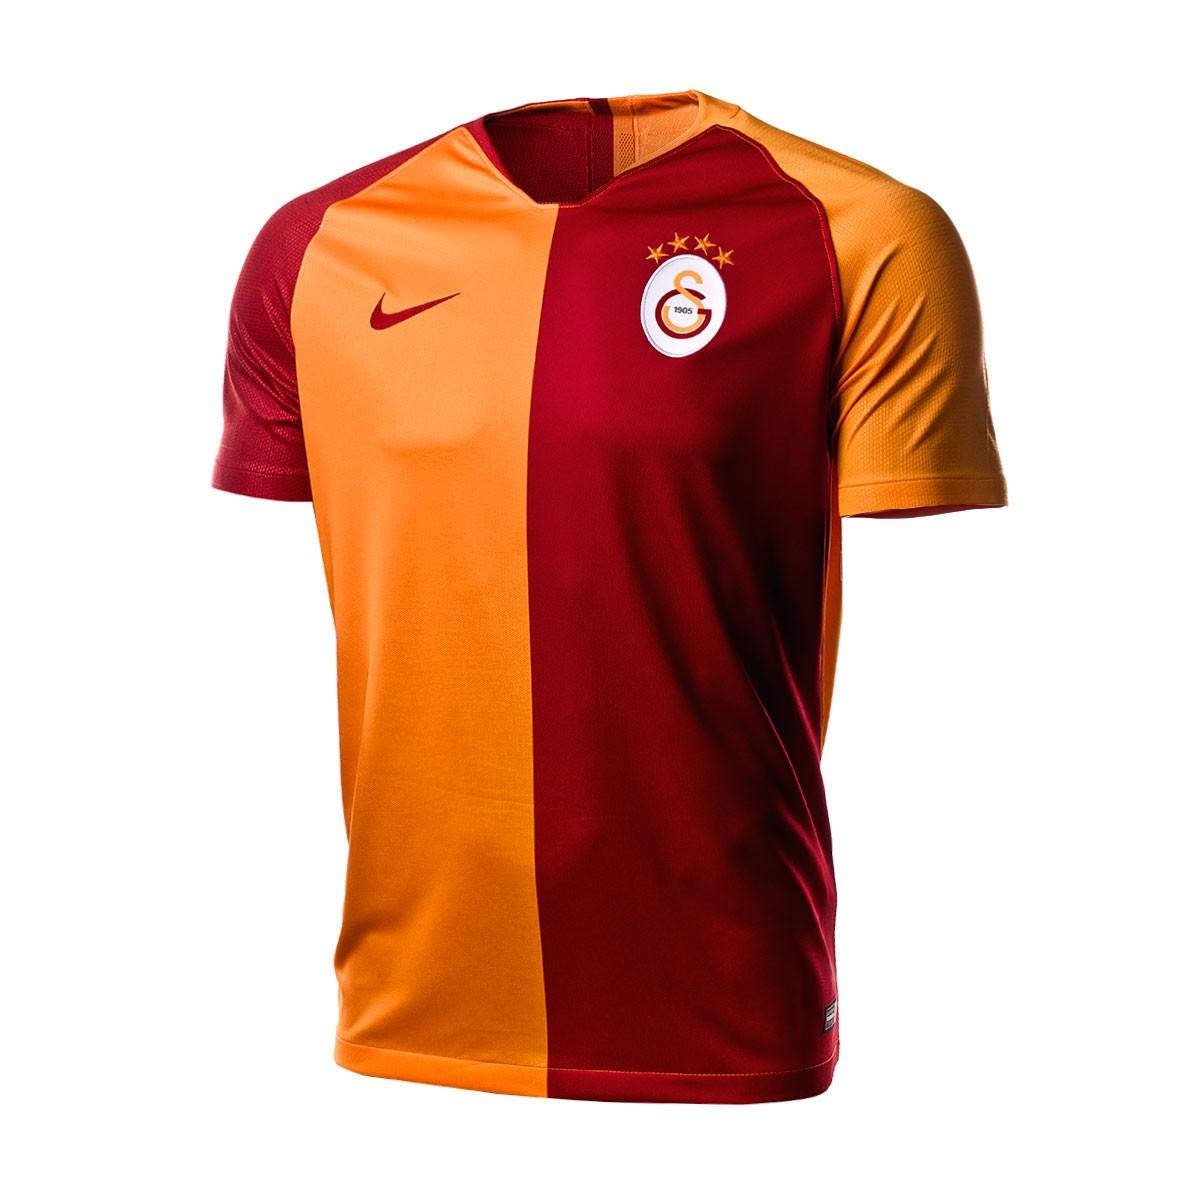 promo code b95de b4b2a Maglia Nike Galatasaray Stadium Home 2018-2019 Vivid orange-Pepper red -  Negozio di calcio Fútbol Emotion